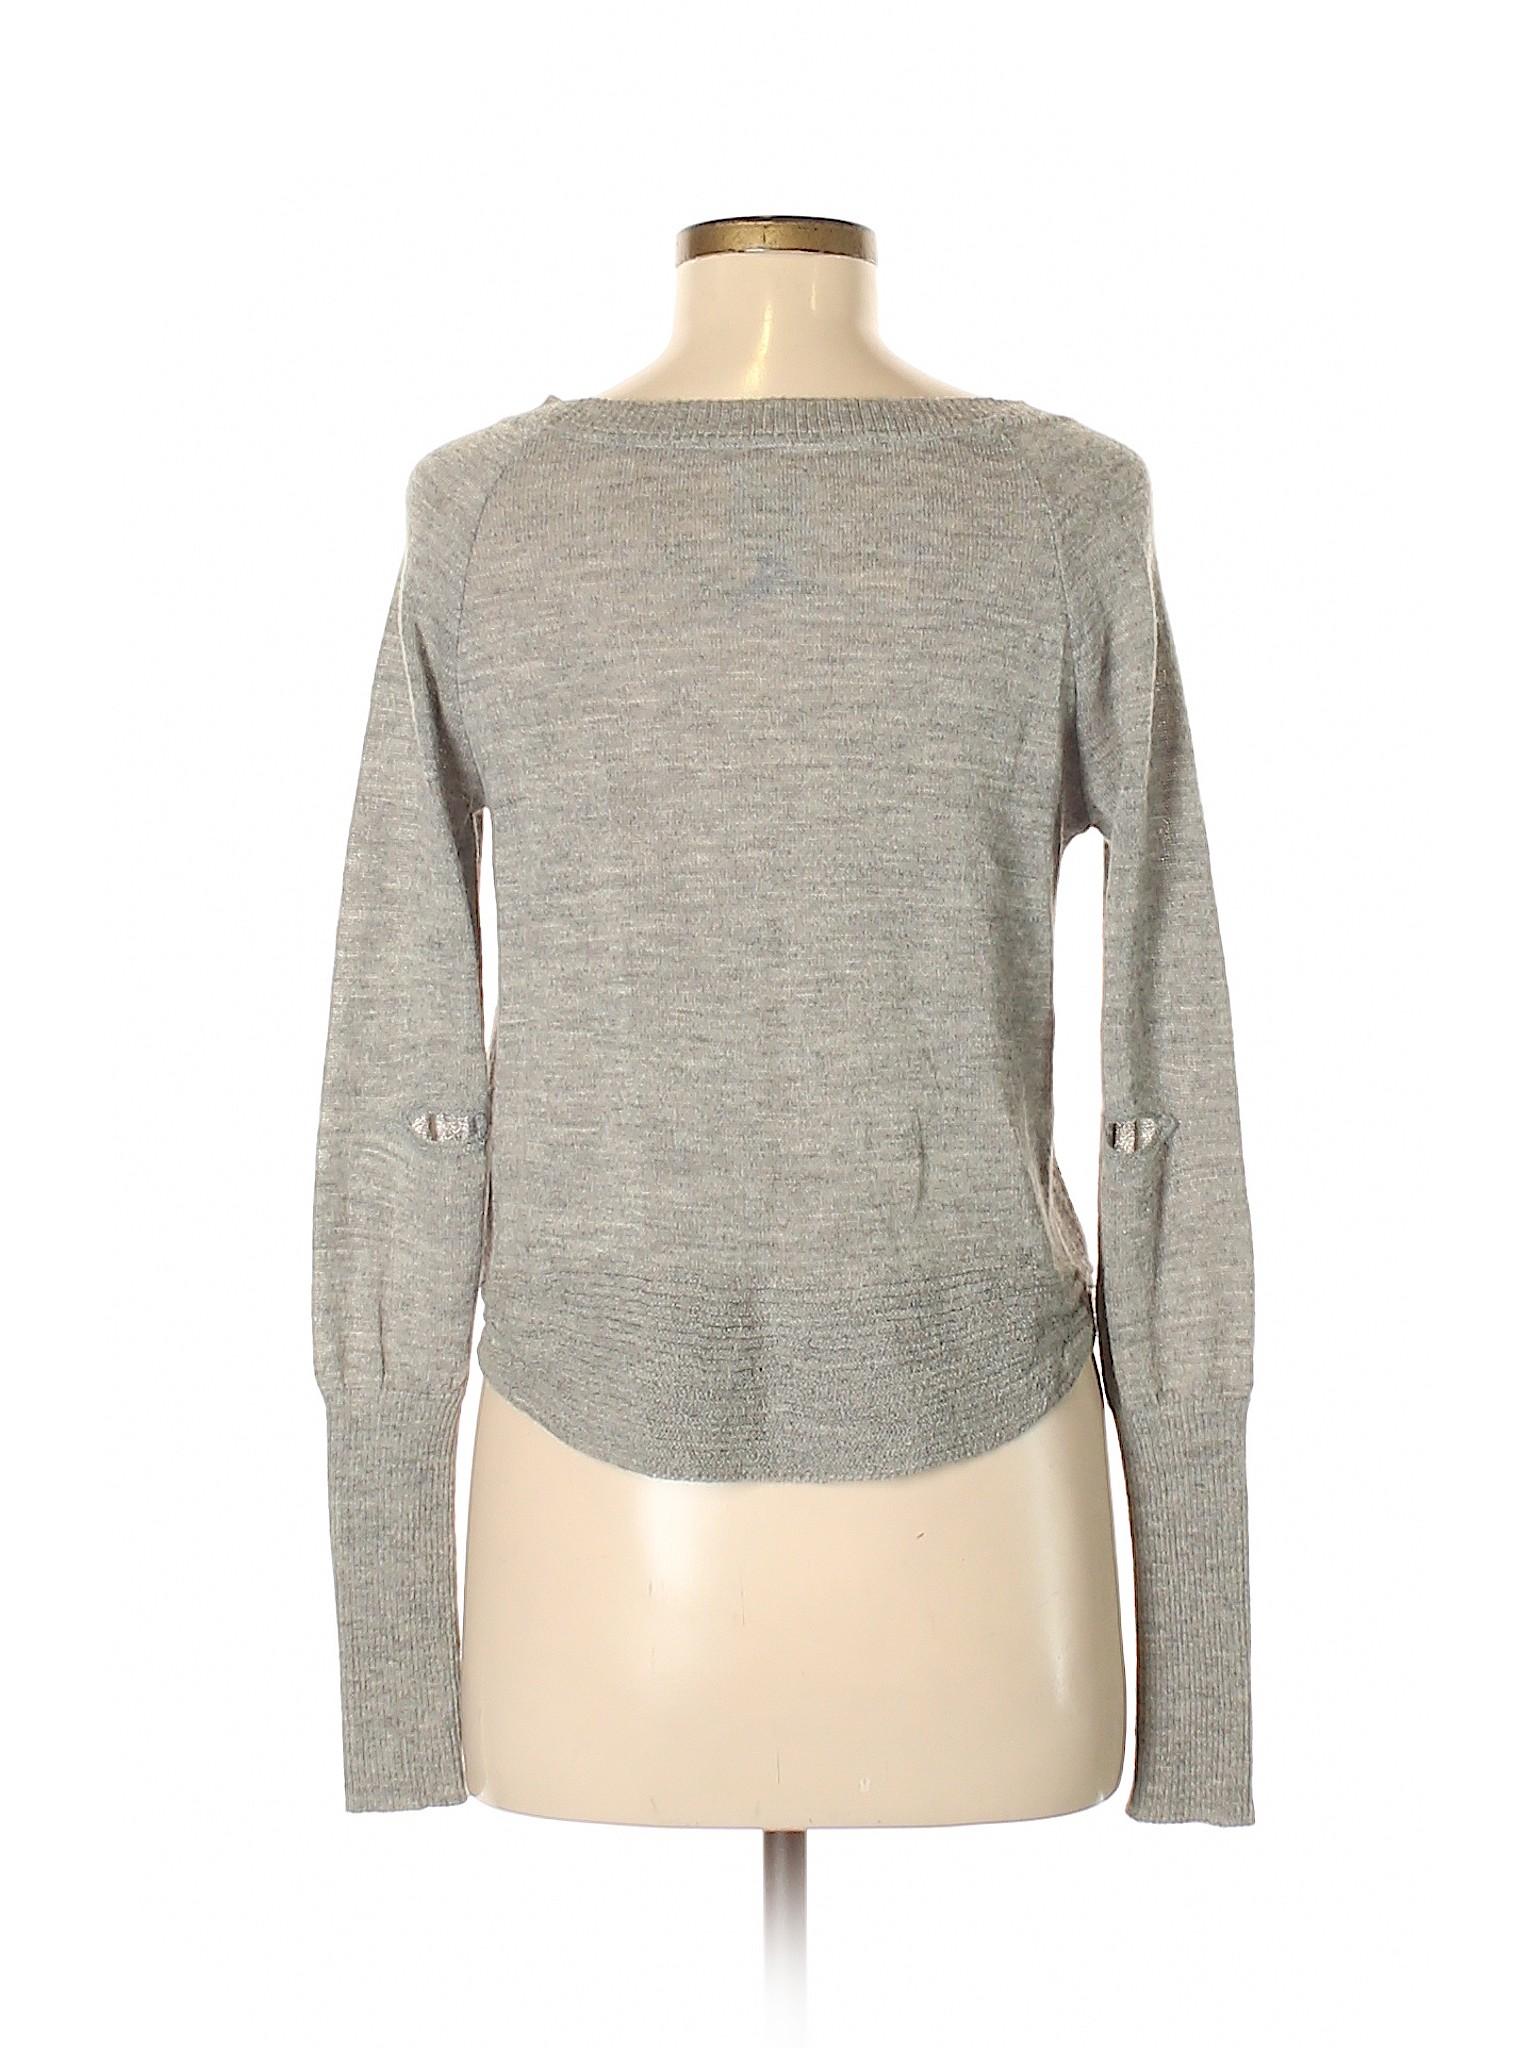 8f3ec709a Dolce Vita 100% Baby Alpaca Solid Gray Pullover Sweater Size M - 80 ...